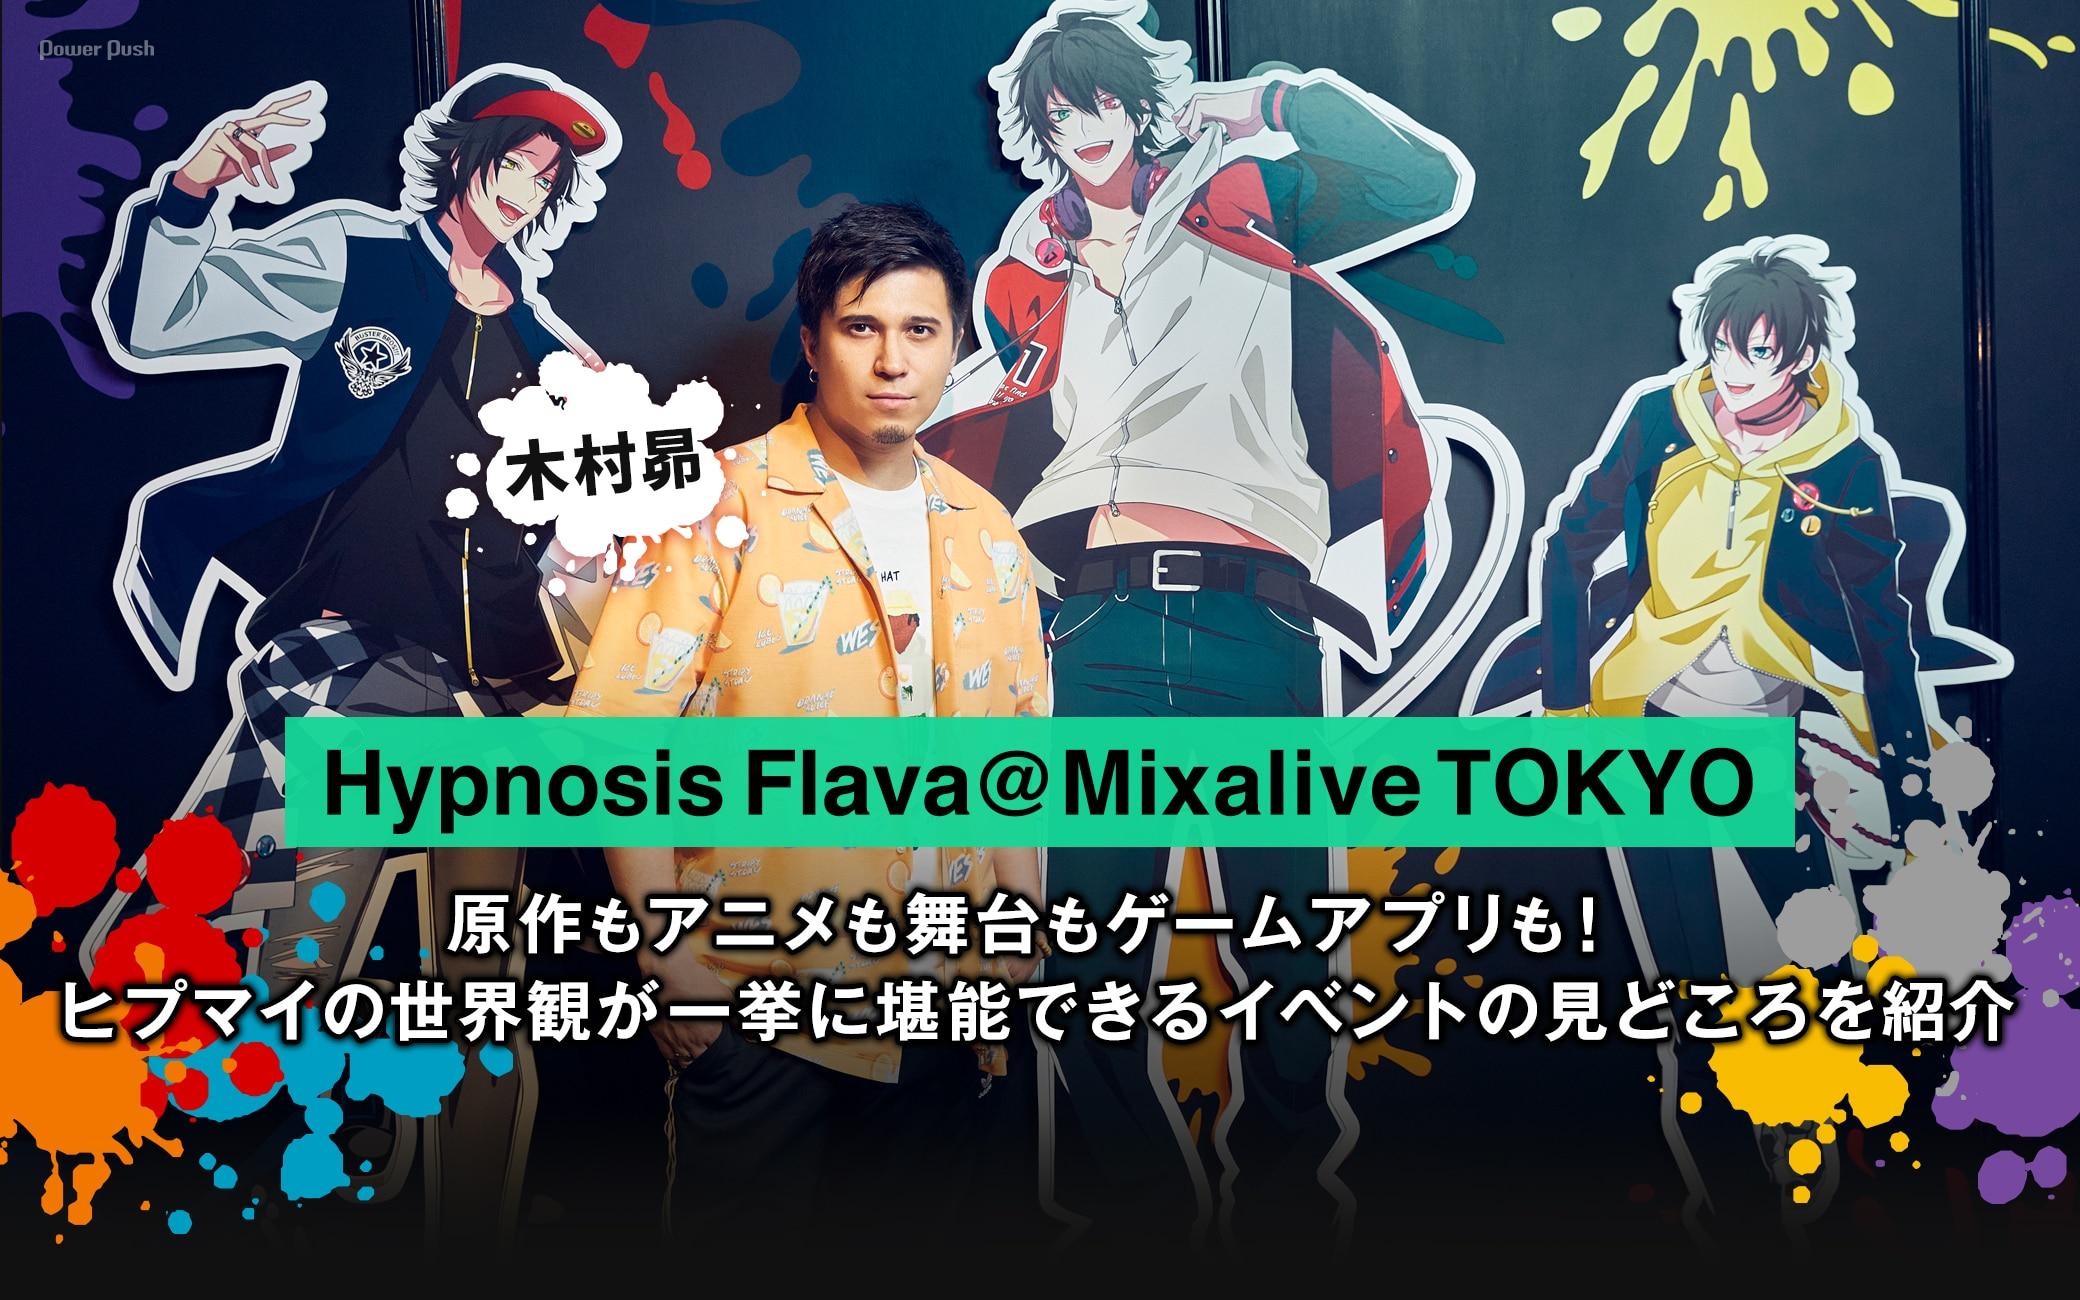 「Hypnosis Flava@Mixalive TOKYO」木村昴 原作もアニメも舞台もゲームアプリも!ヒプマイの世界観が一挙に堪能できるイベントの見どころを紹介